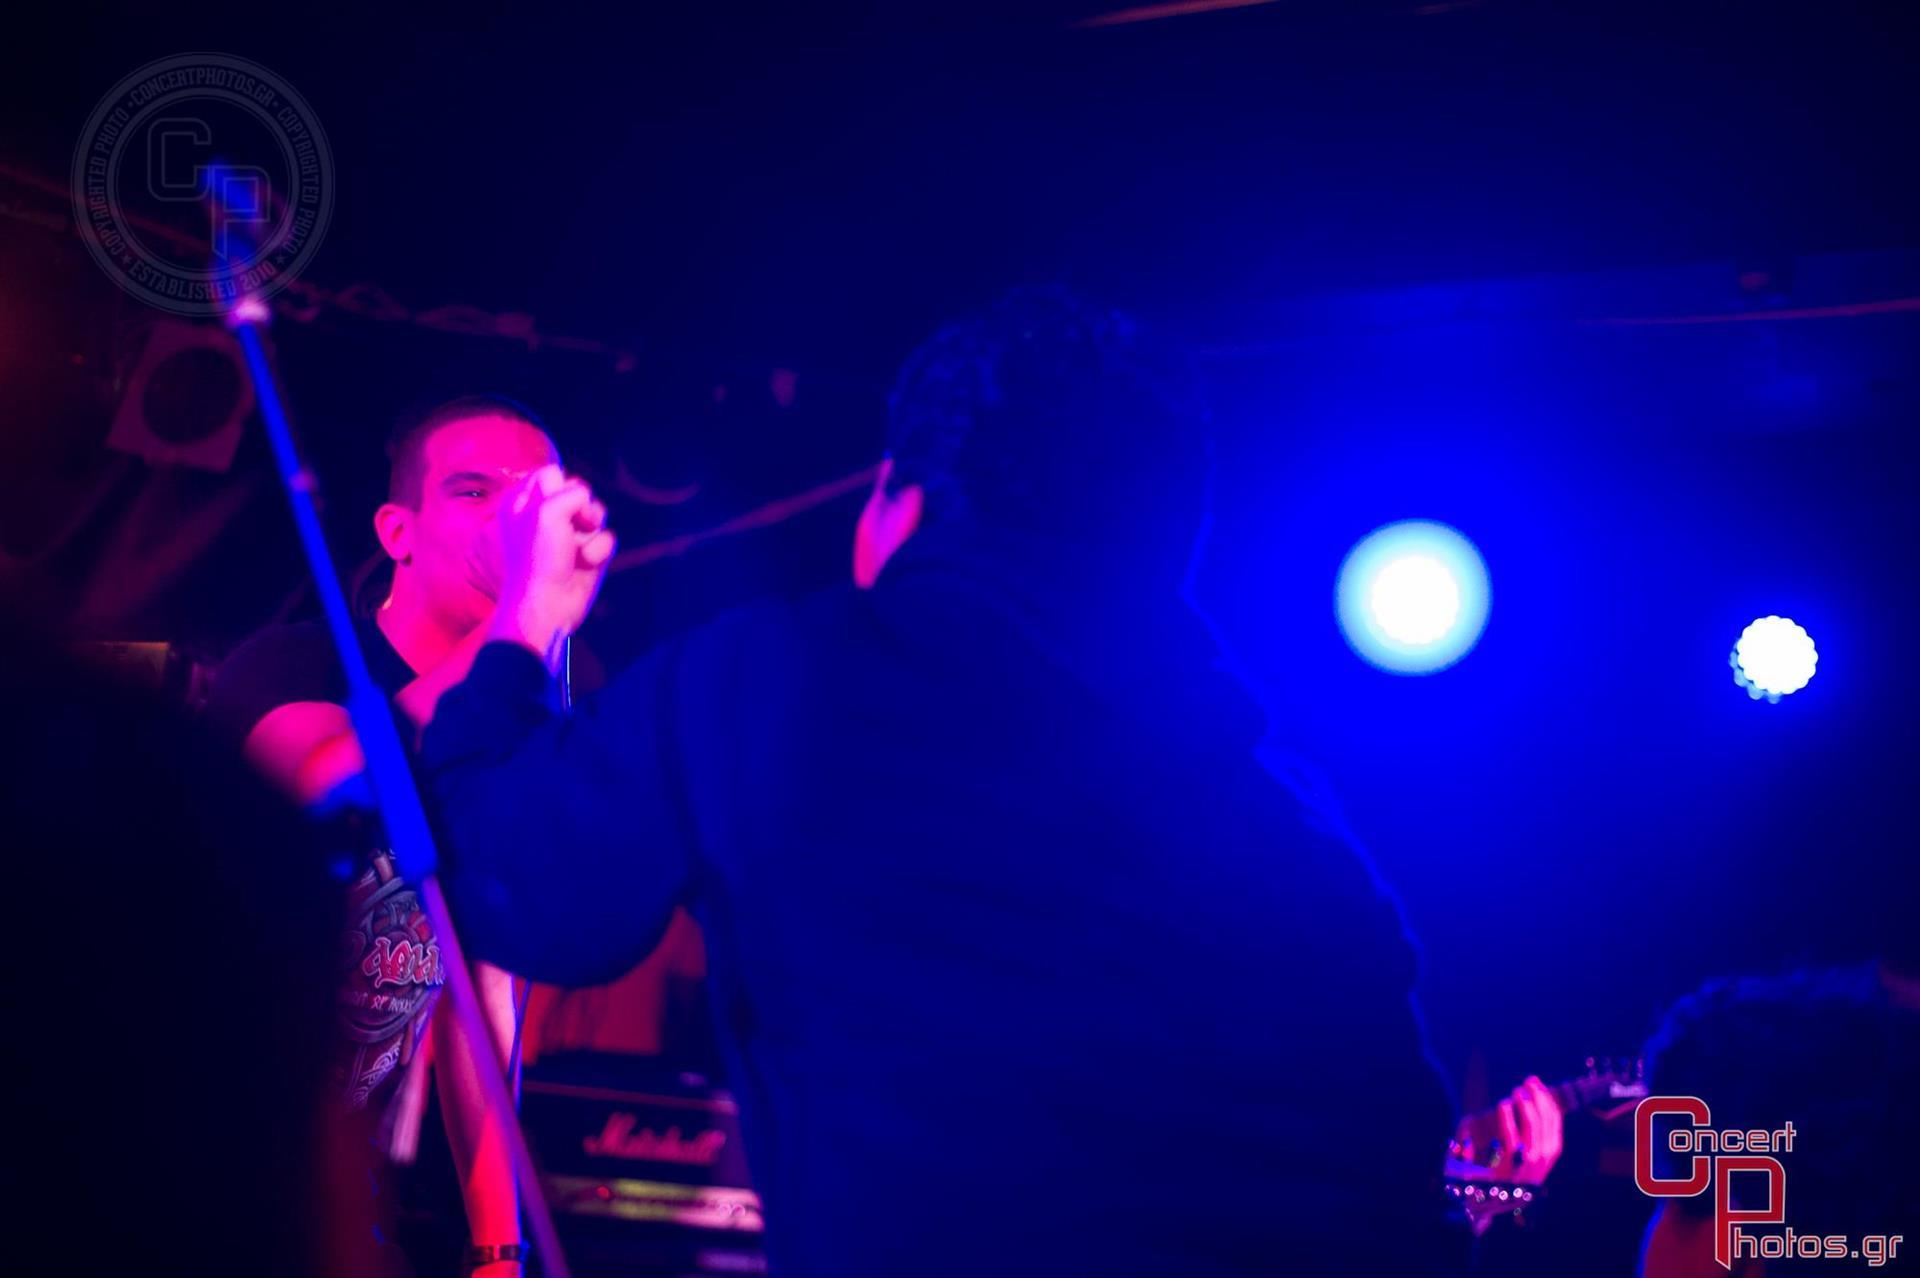 Battle Of The Bands Athens - Leg 3- photographer:  - ConcertPhotos - 20150104_2103_01